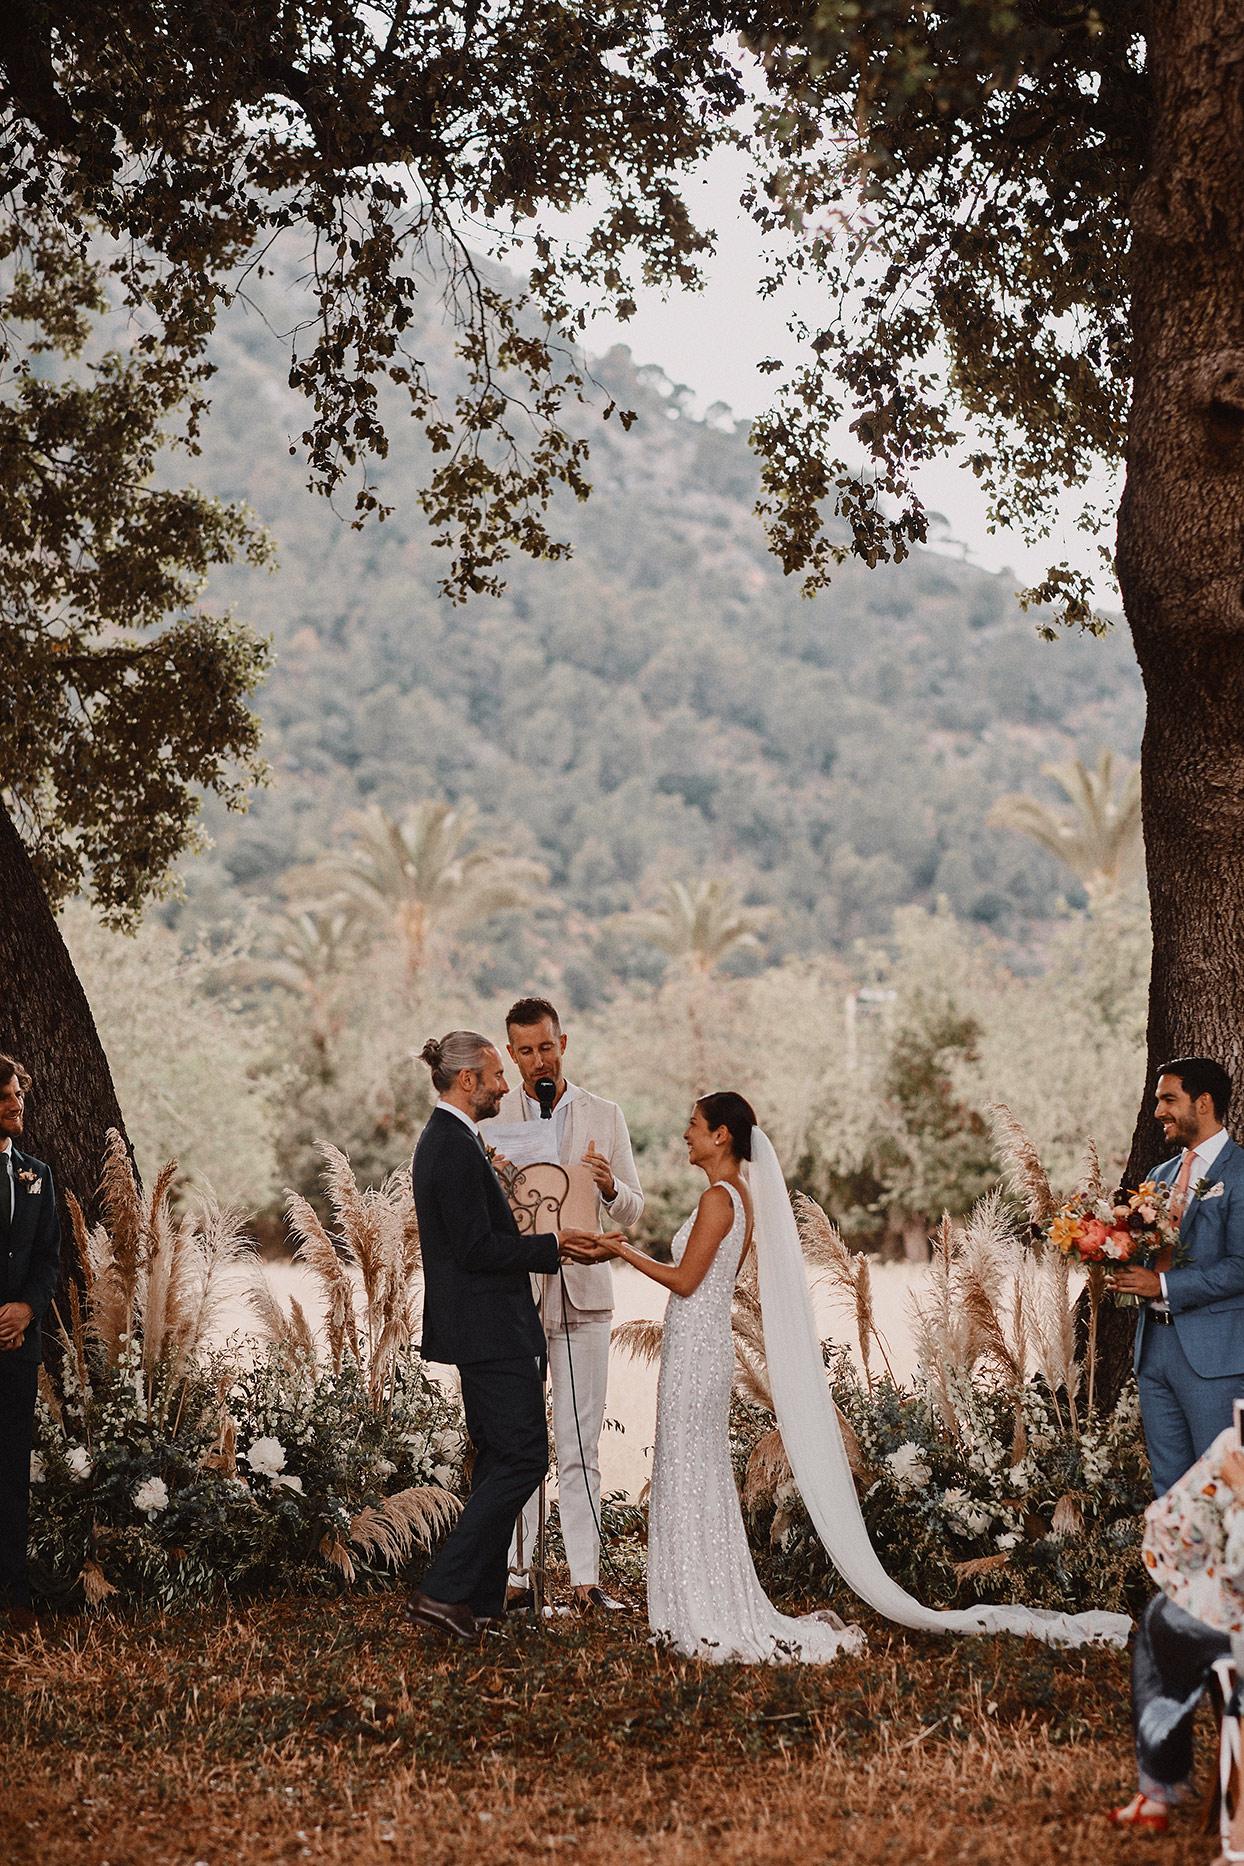 pomme daniel wedding ceremony under trees